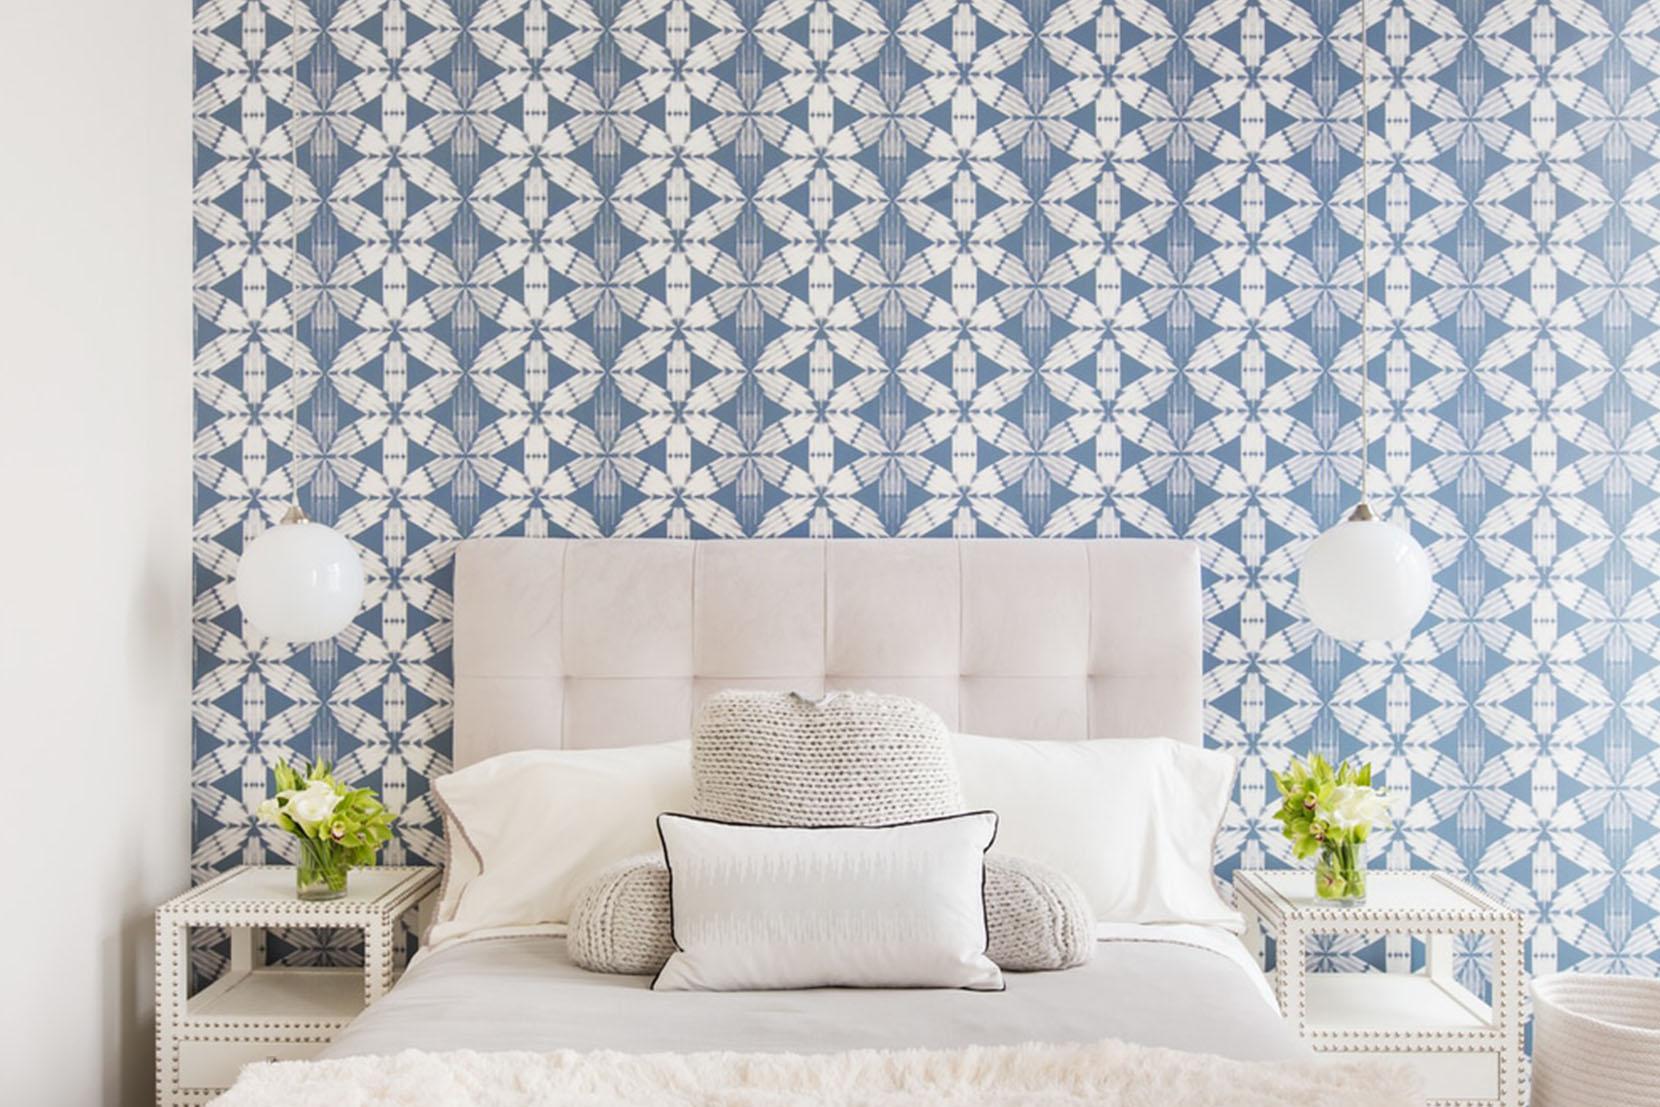 Modern-Bedroom-Lighting-Opaline-Orbs-Bedside.jpg